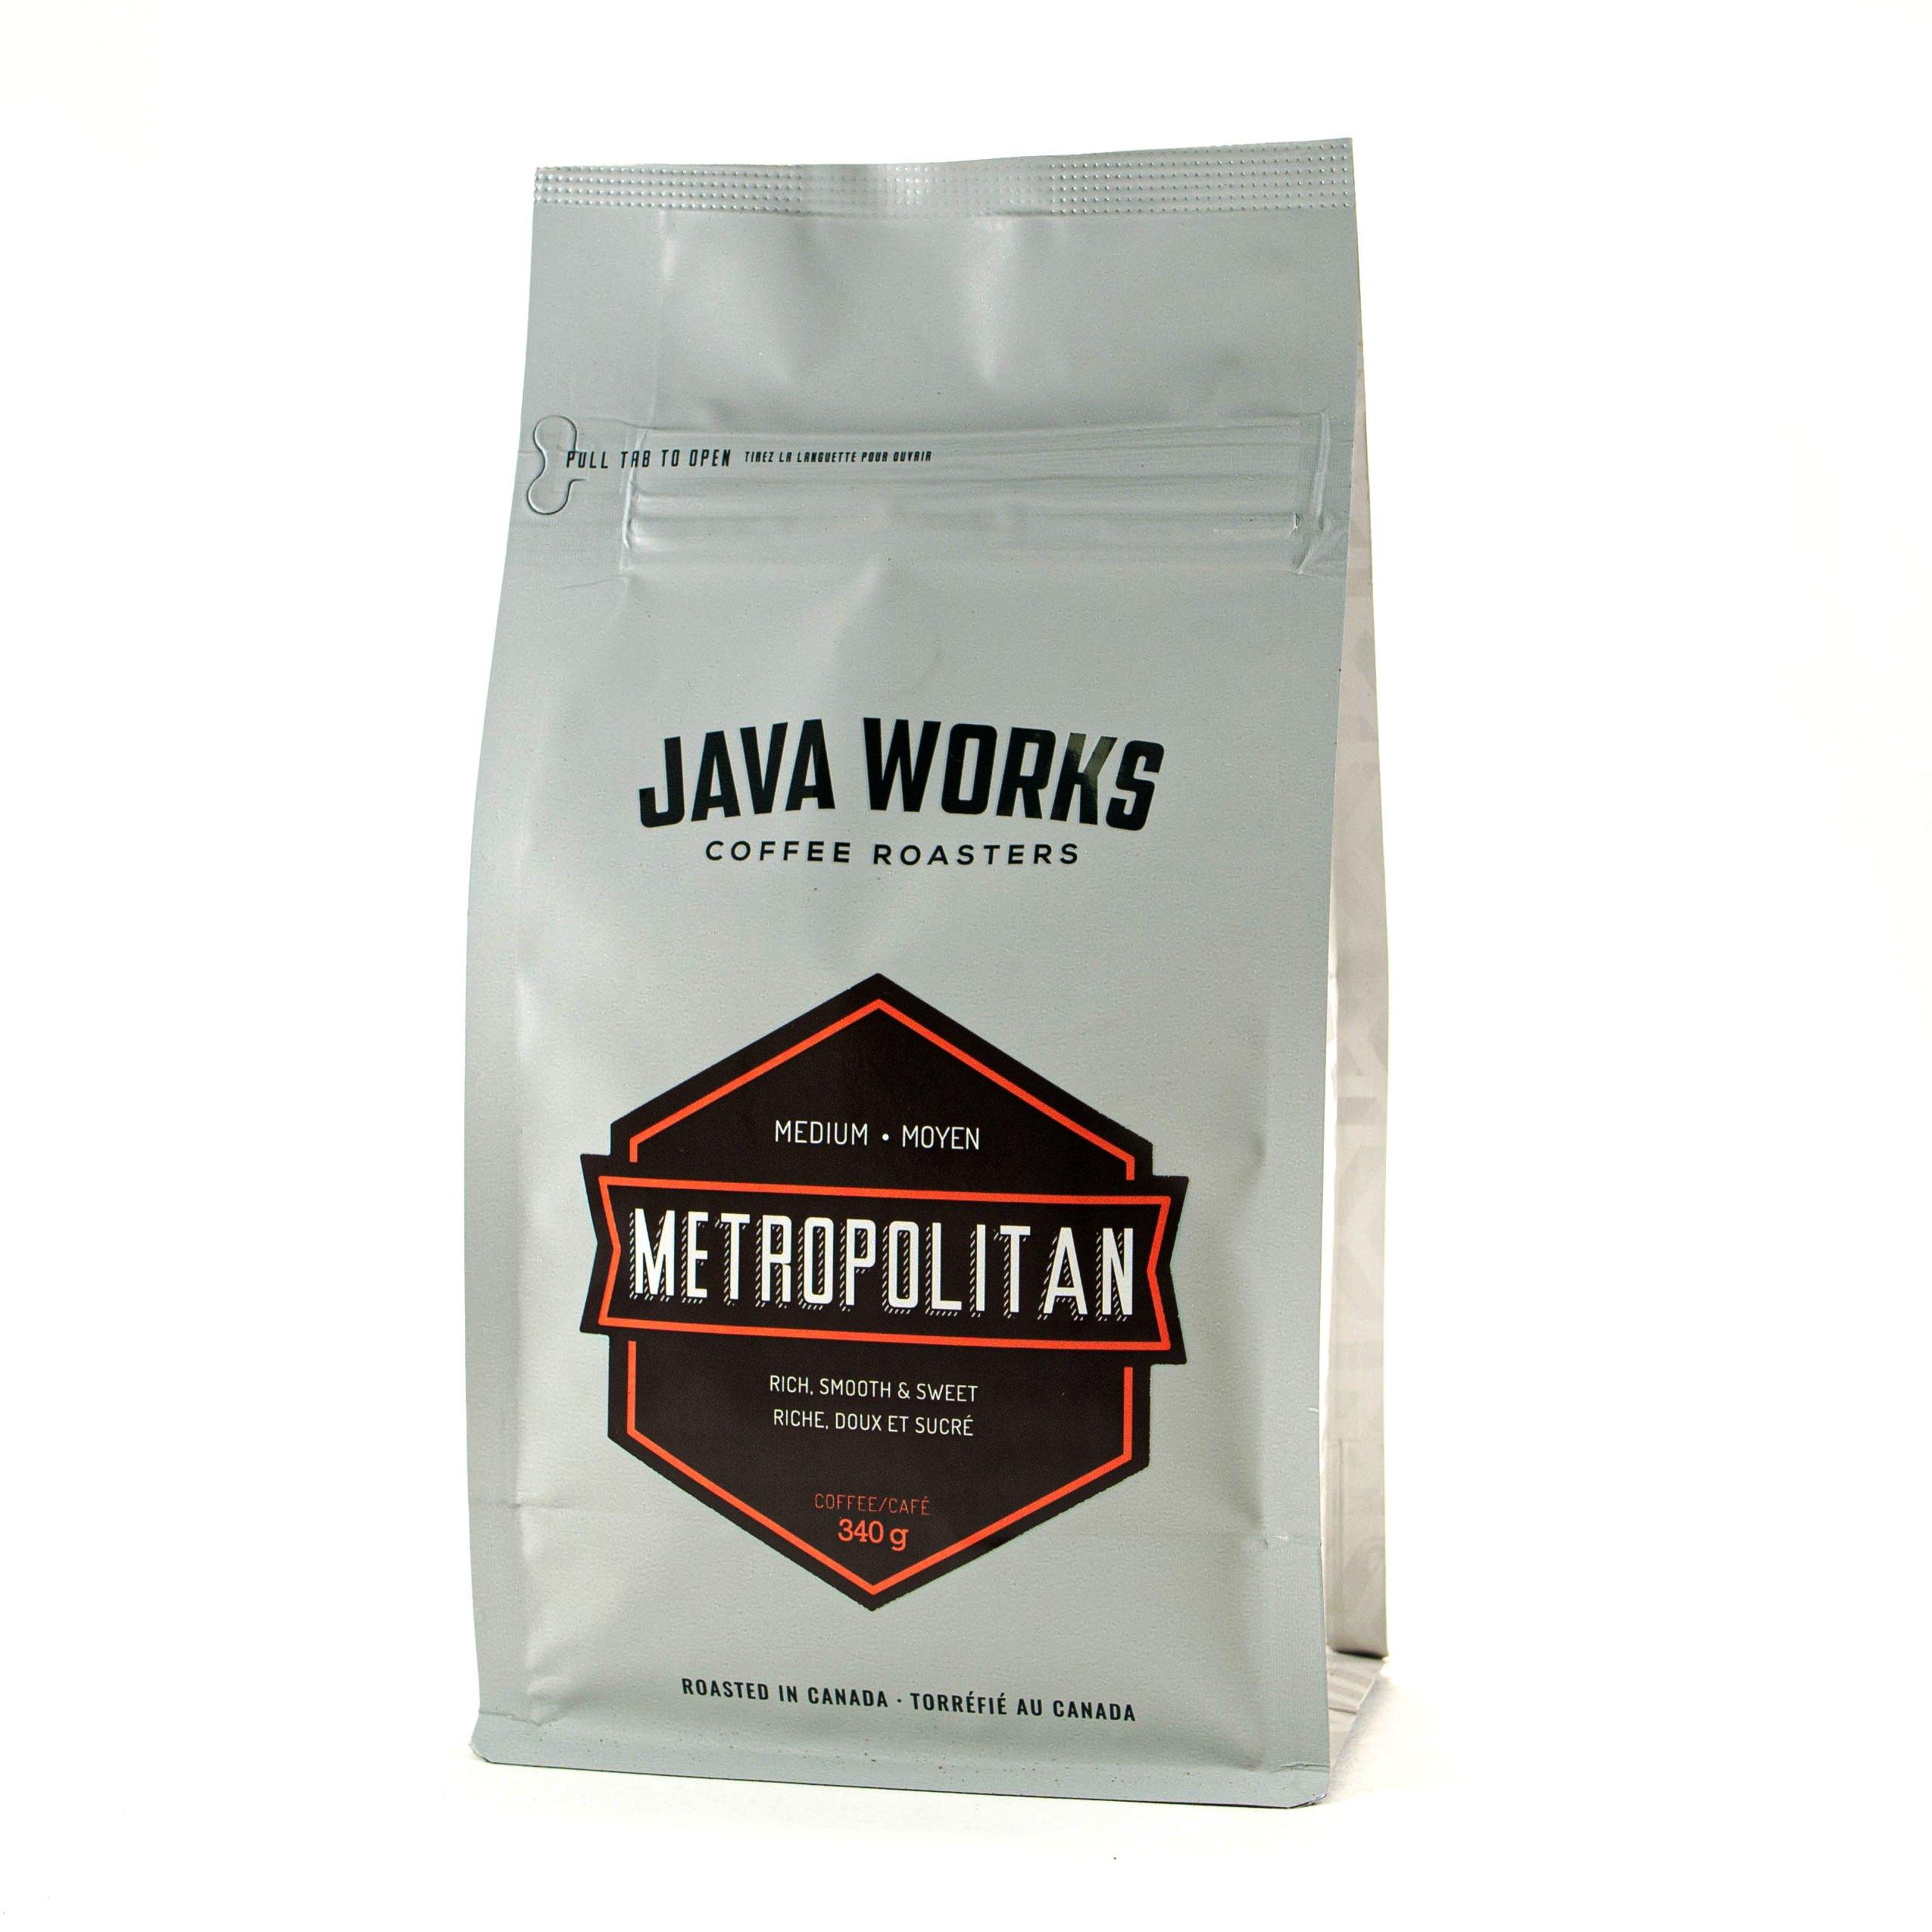 Java Works Metropolitan Blend Whole Beans - 12oz / 340g Bag